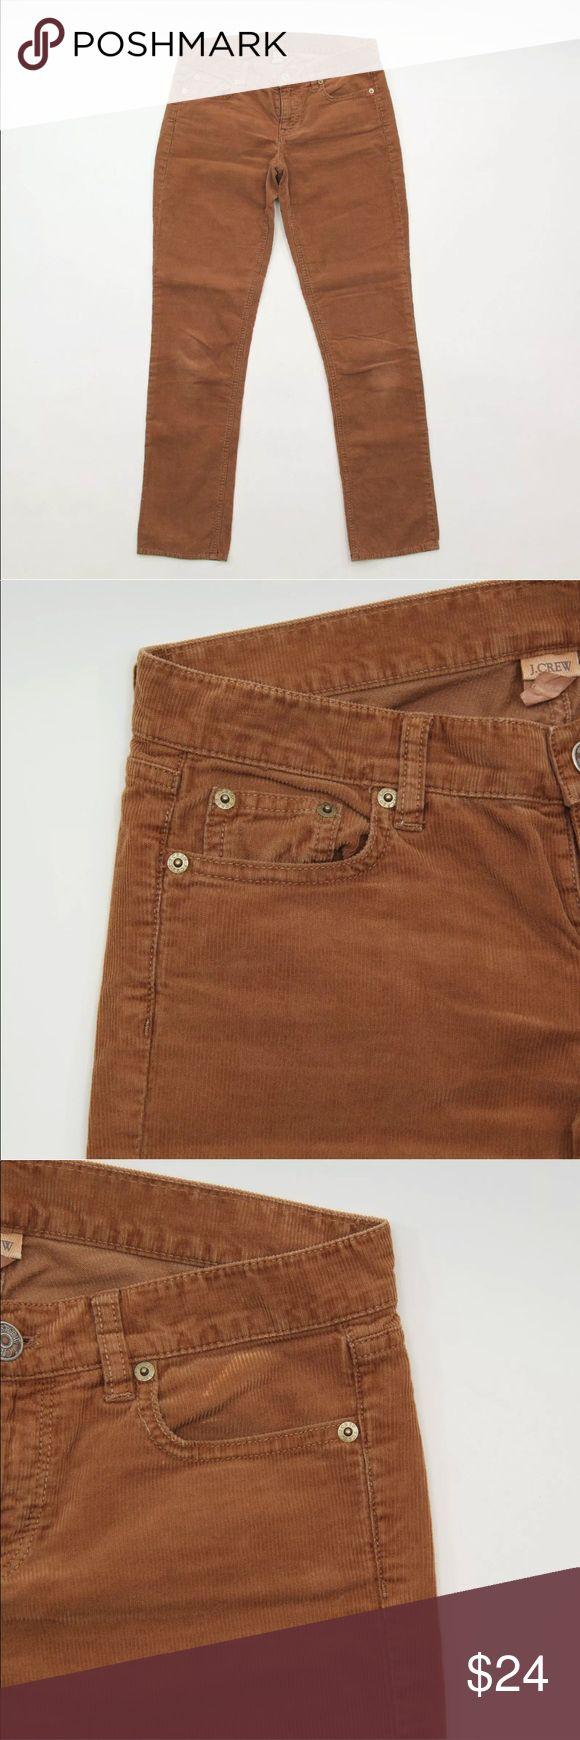 "J Crew 2 Short Vintage Matchstick Skinny Corduroy J Crew  Womens Pants  Size 2 Short 26S Vintage Matchstick  Skinny Corduroy  Brown  City Fit 29"" inseam 15"" across waist J. Crew Pants Skinny"